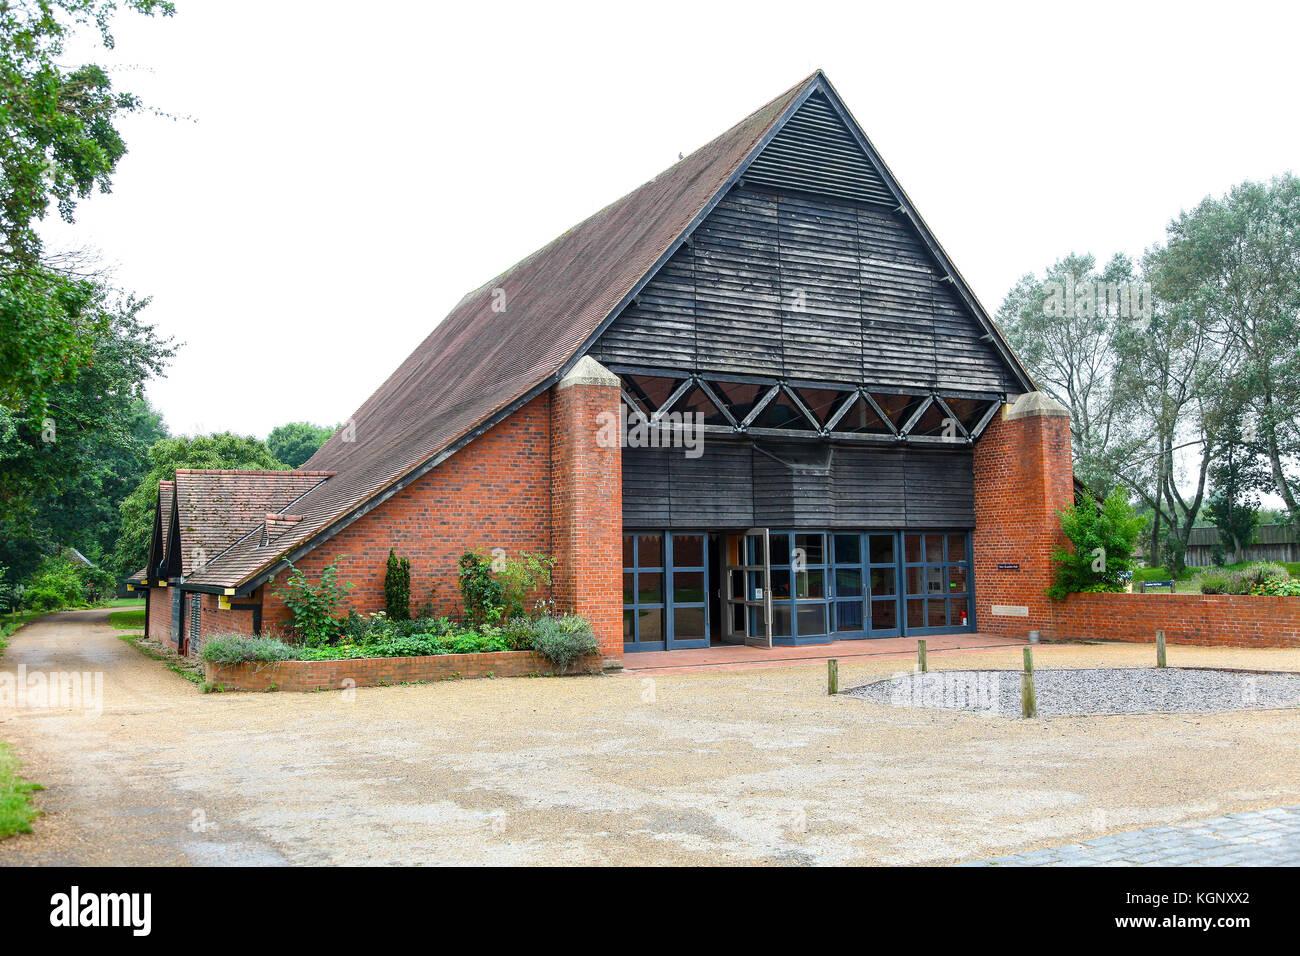 Guesten Hall at Avoncroft Museum of Buildings, Stoke Heath, Bromsgrove, Worcestershire, England, UK - Stock Image